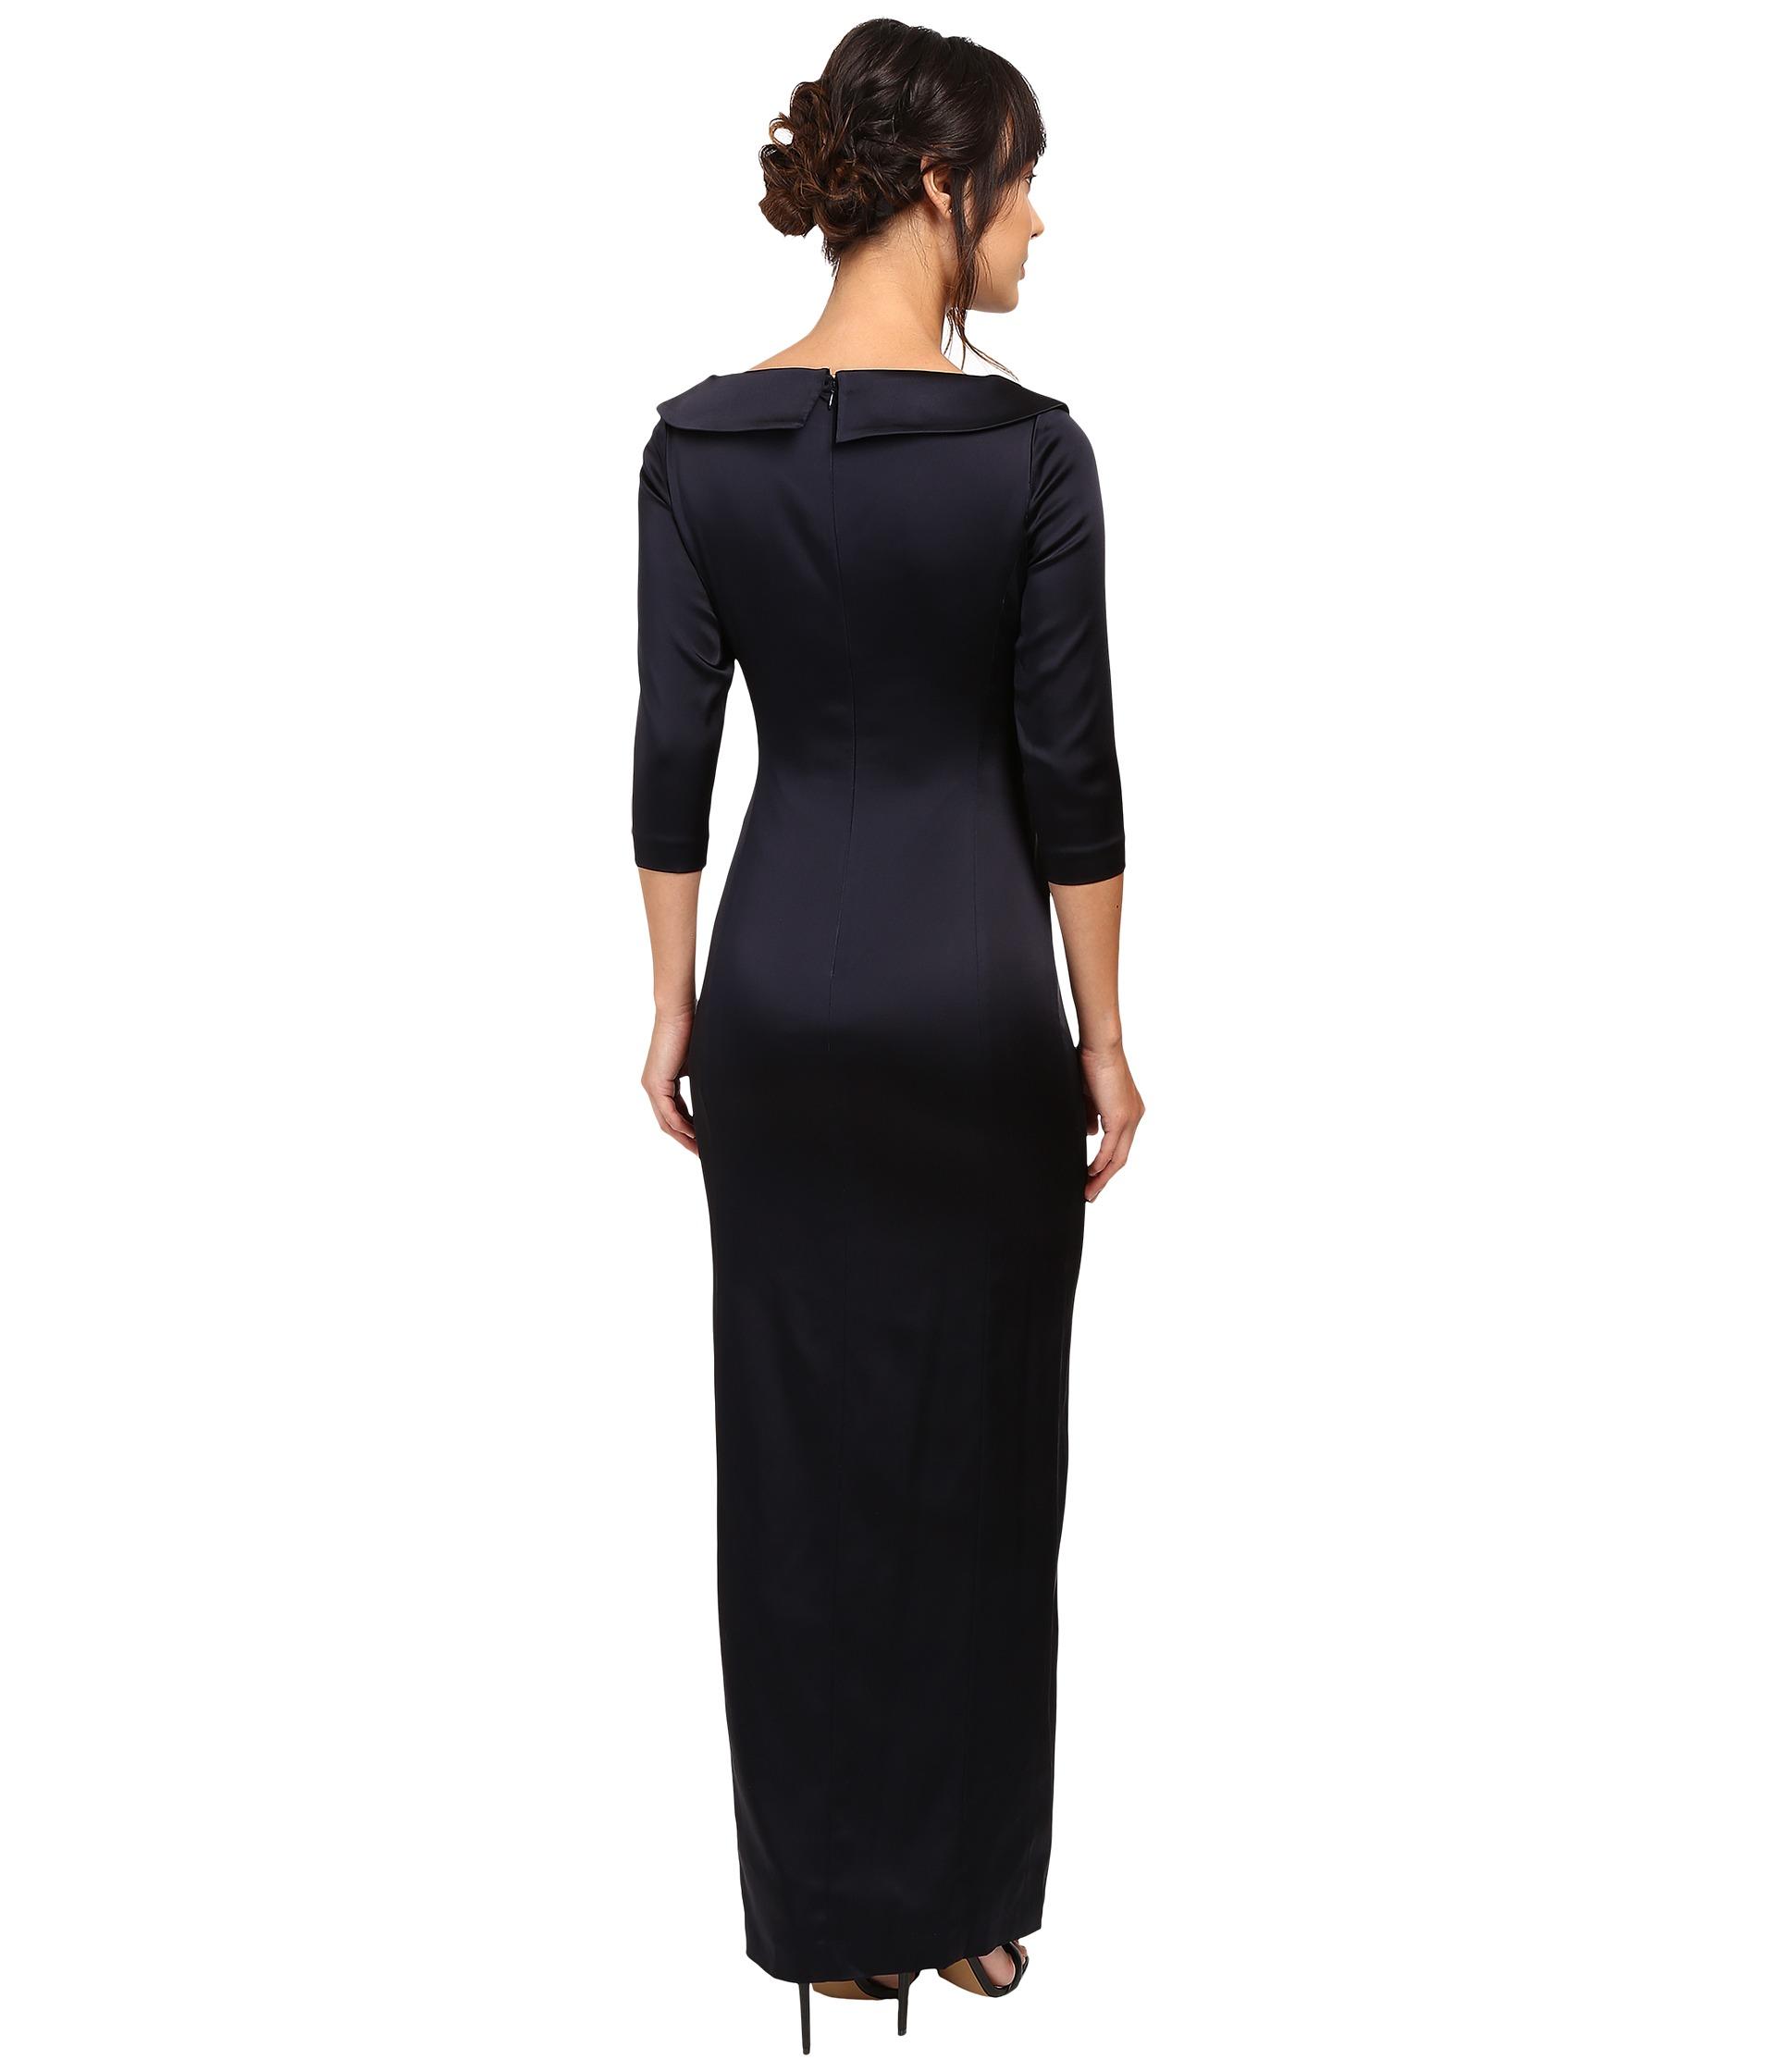 Tahari By ASL Portrait Collar Long Sleeve Gown Navy